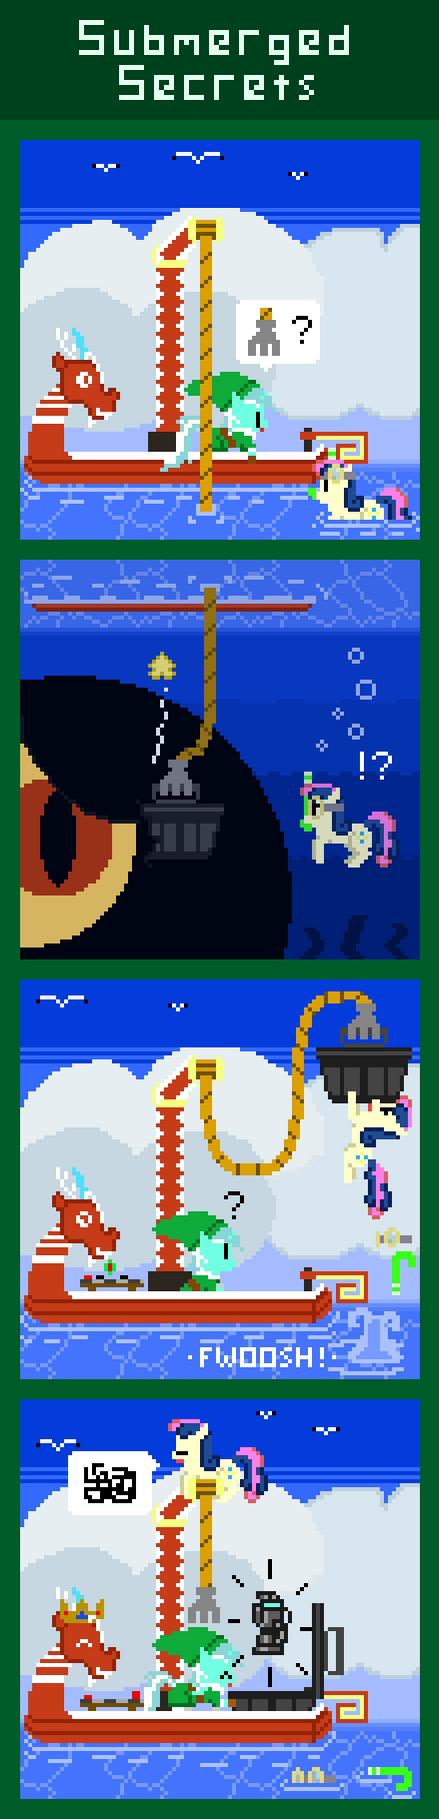 Submerged Secrets by Zztfox